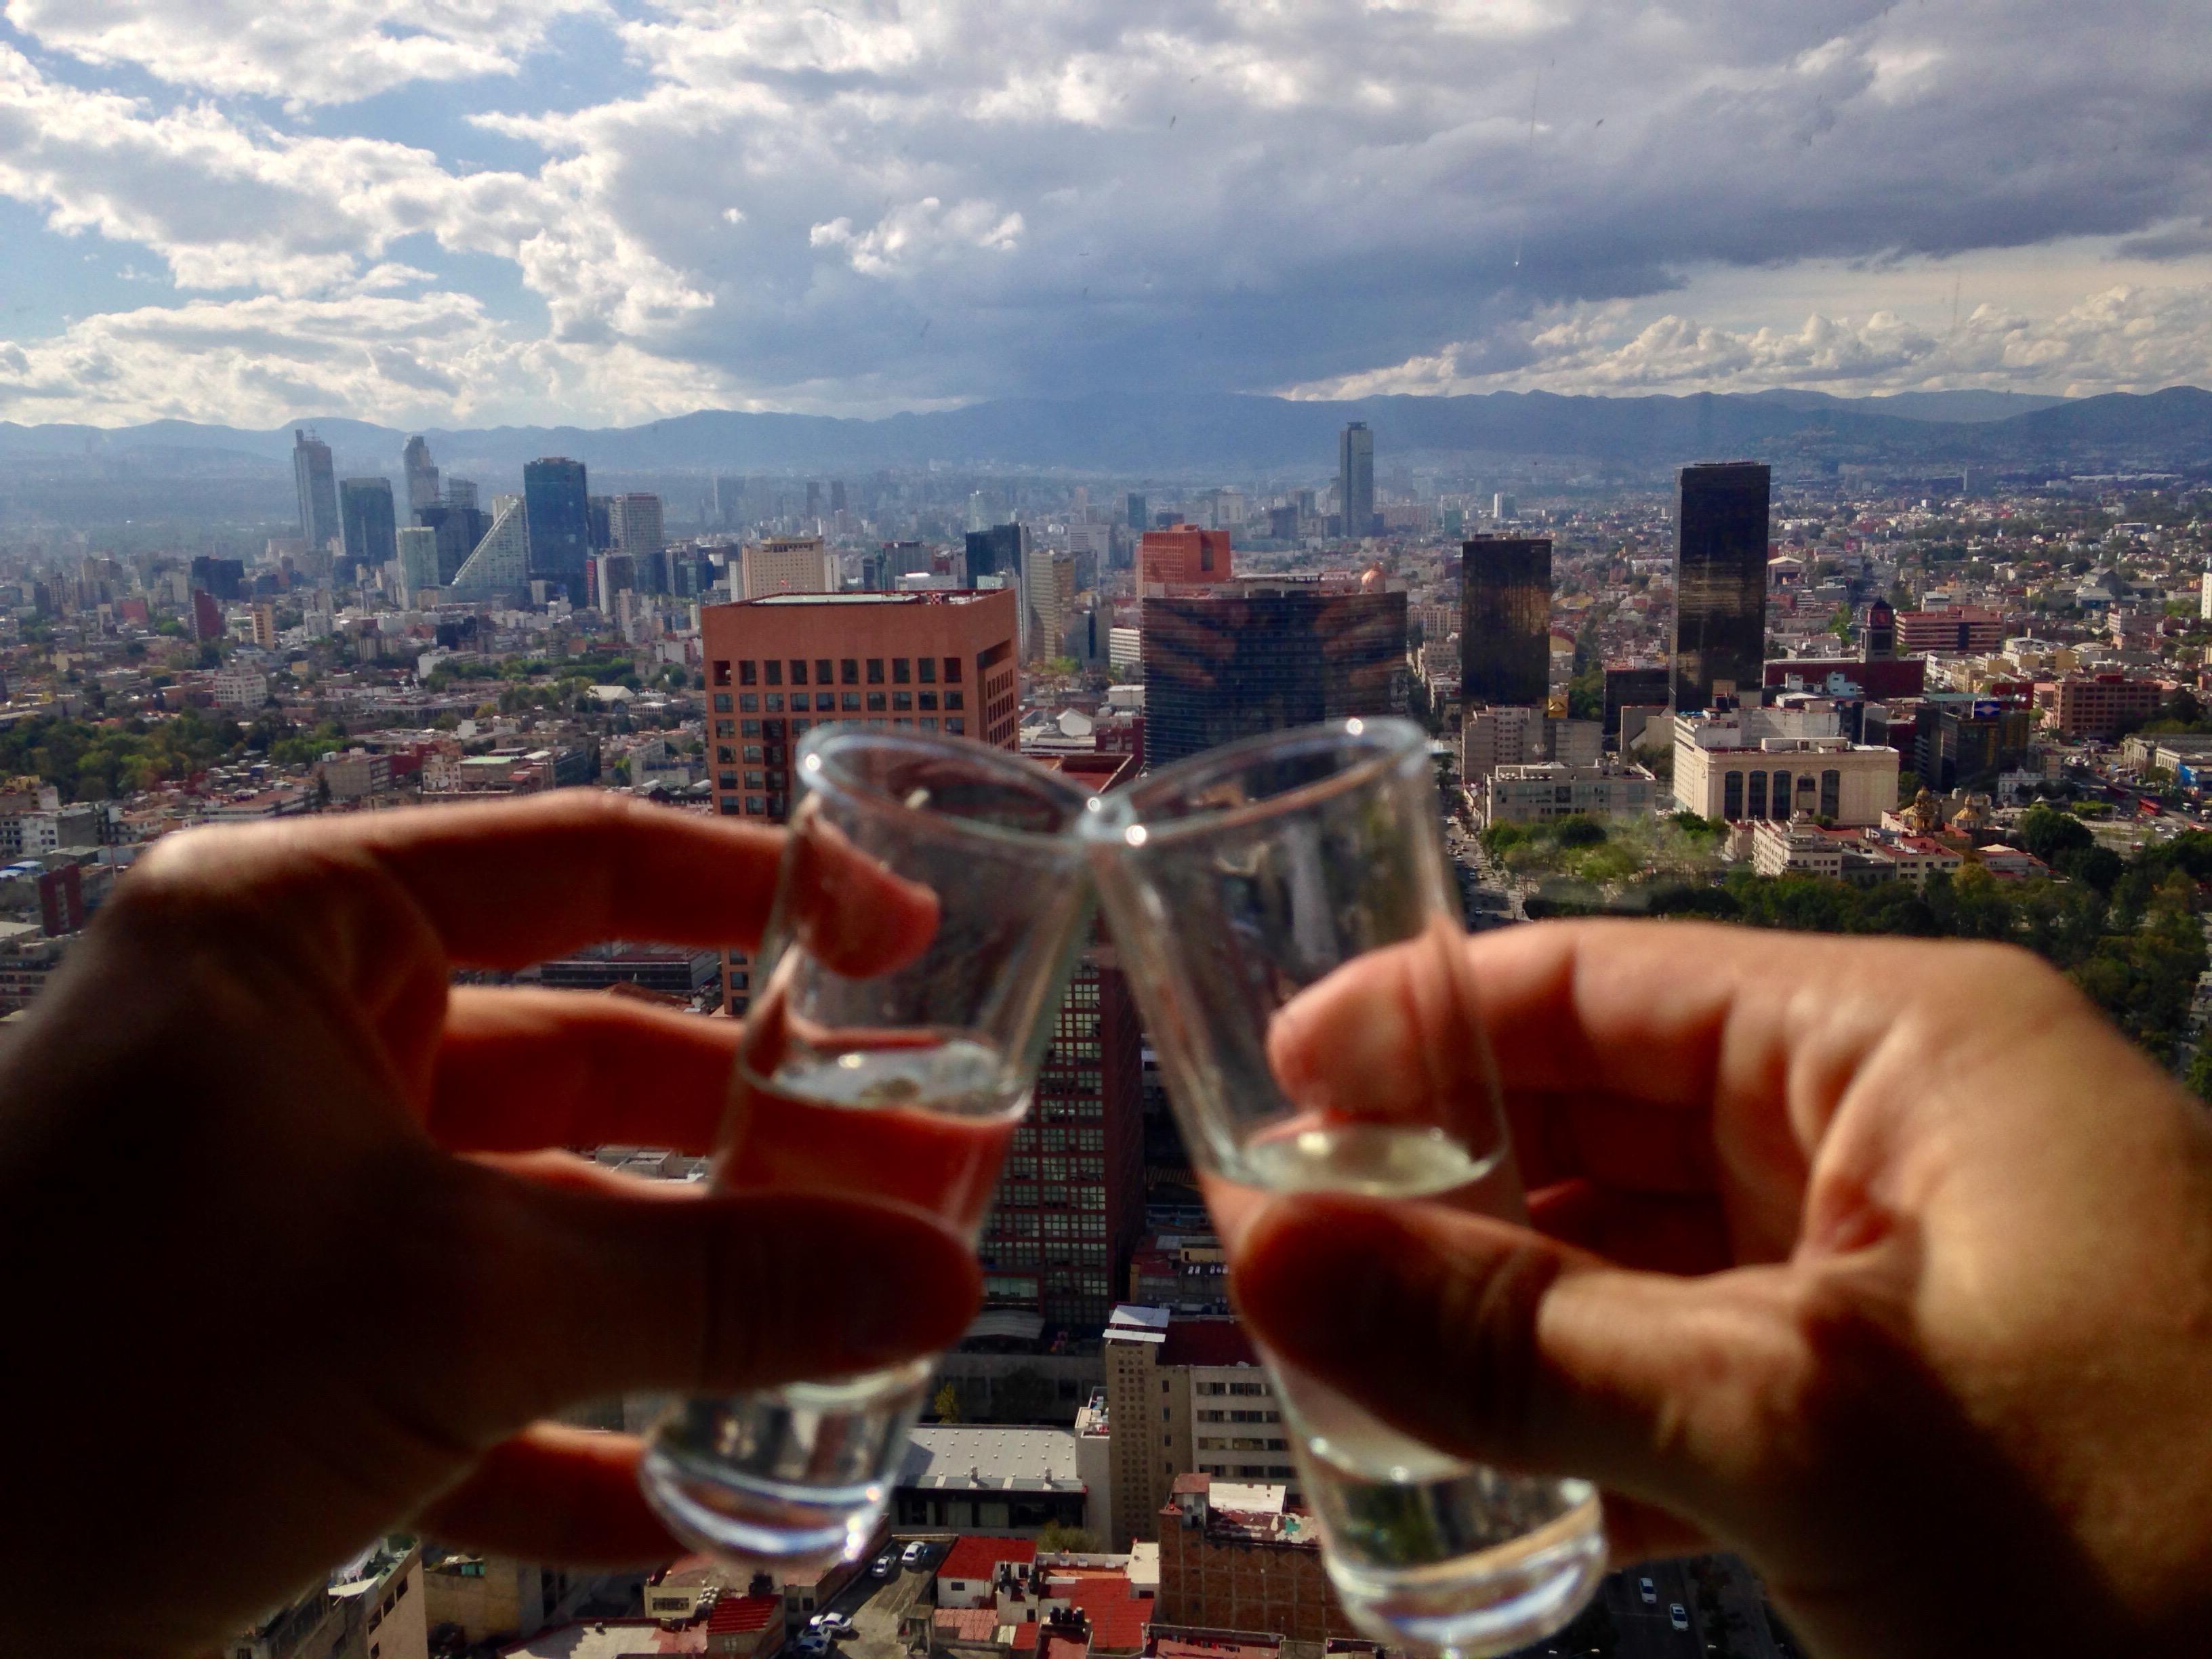 Mezcal & a good view - cheers